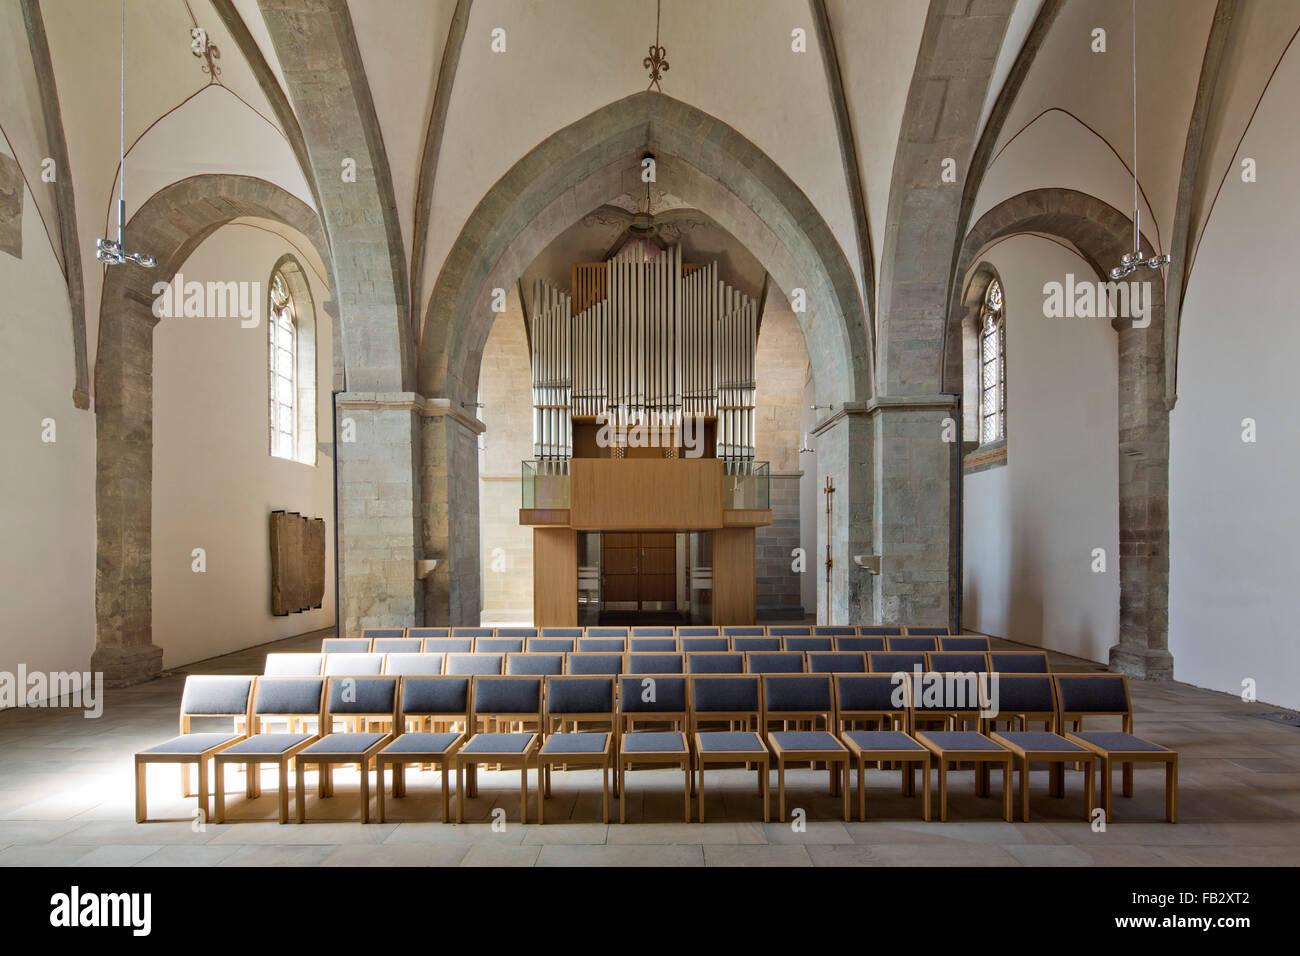 Schwerte, Kirche St. Viktor, Innenraum nach Osten - Stock Image